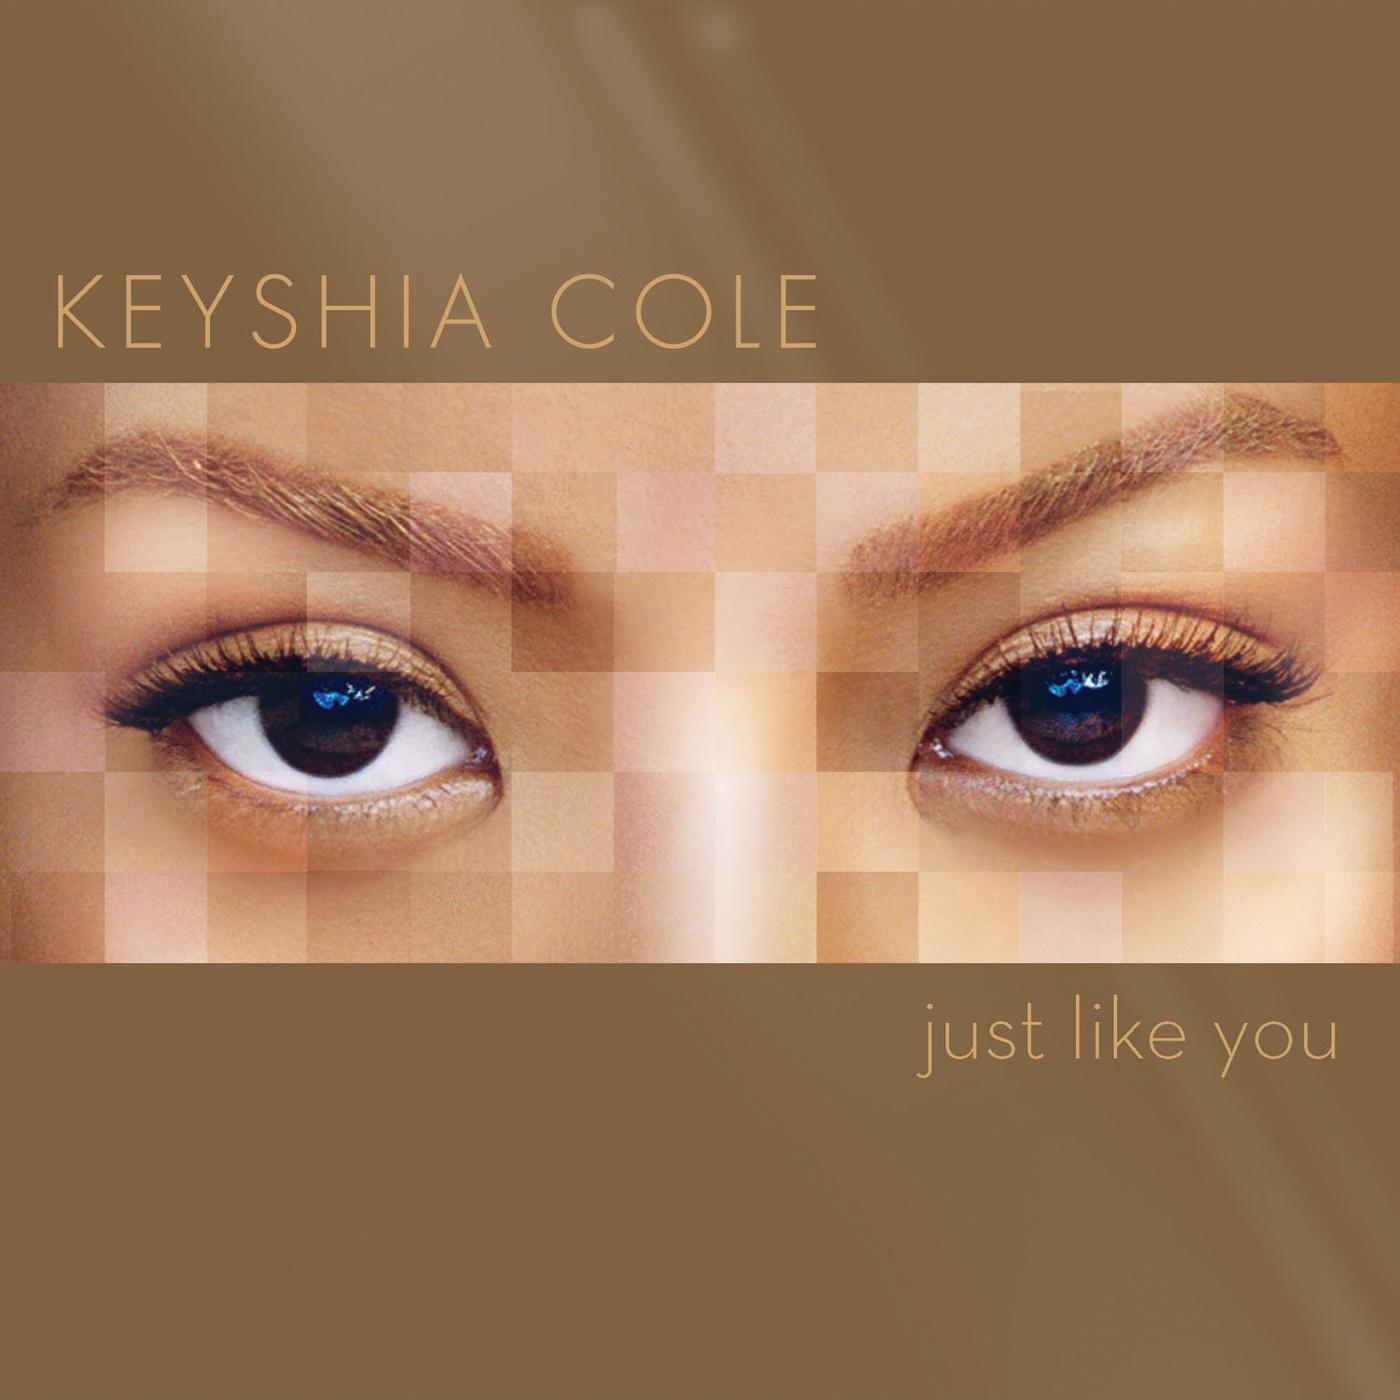 Listen Free to Keyshia Cole - Let It Go Radio | iHeartRadio